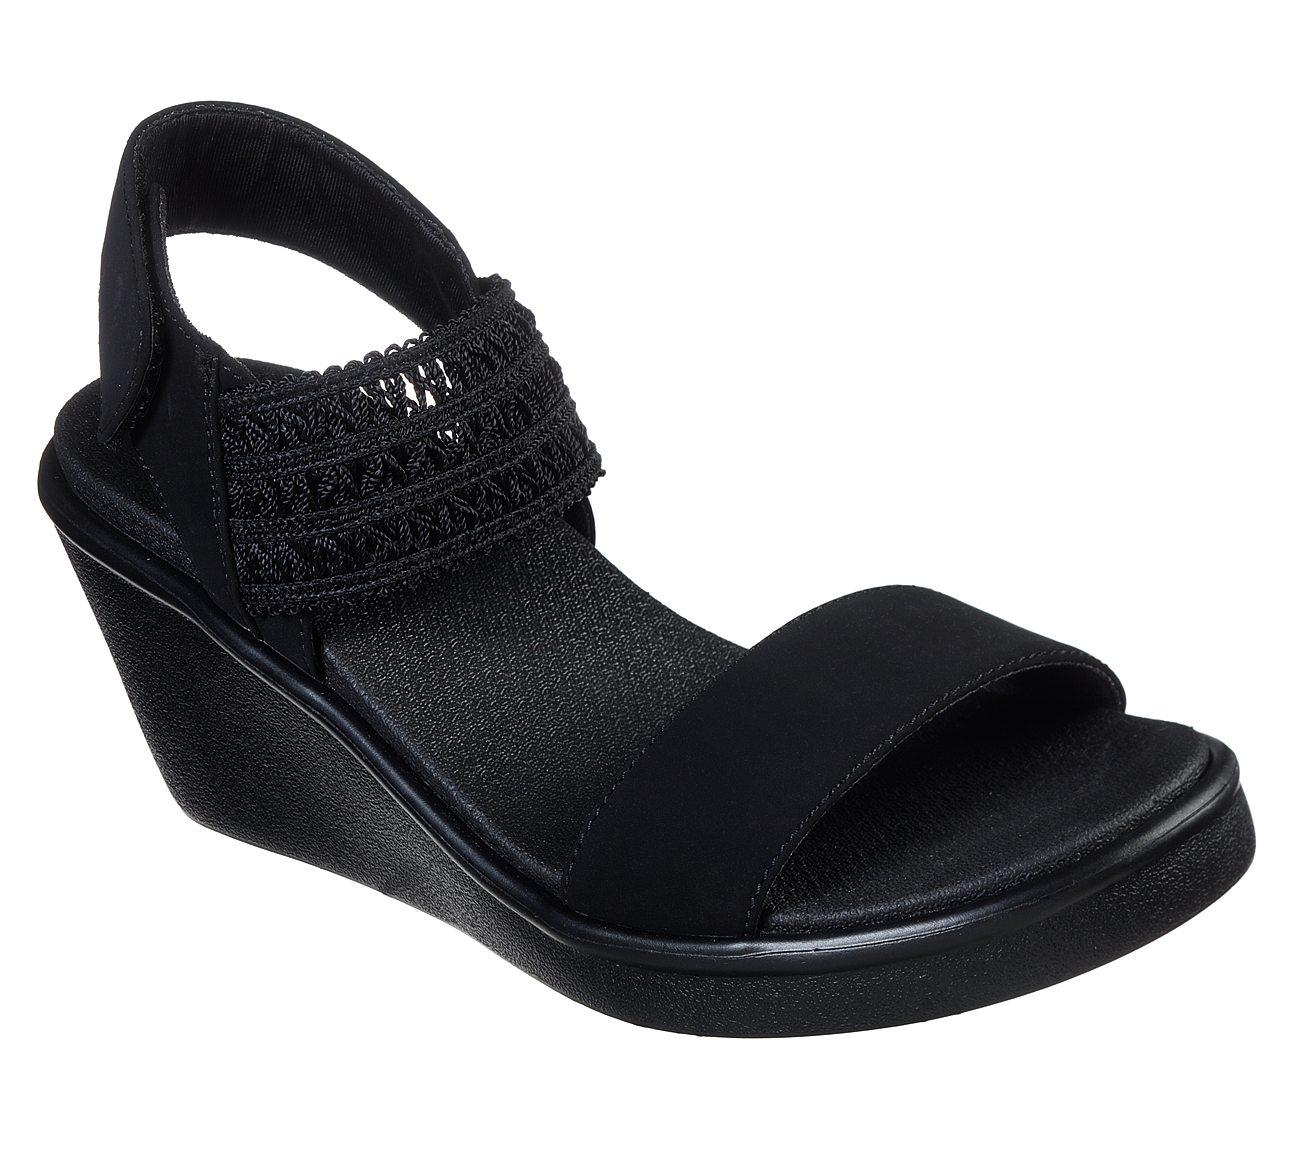 Imperial Eficacia Seguir  Buy SKECHERS Rumble On - Takeover SKECHERS Cali Shoes